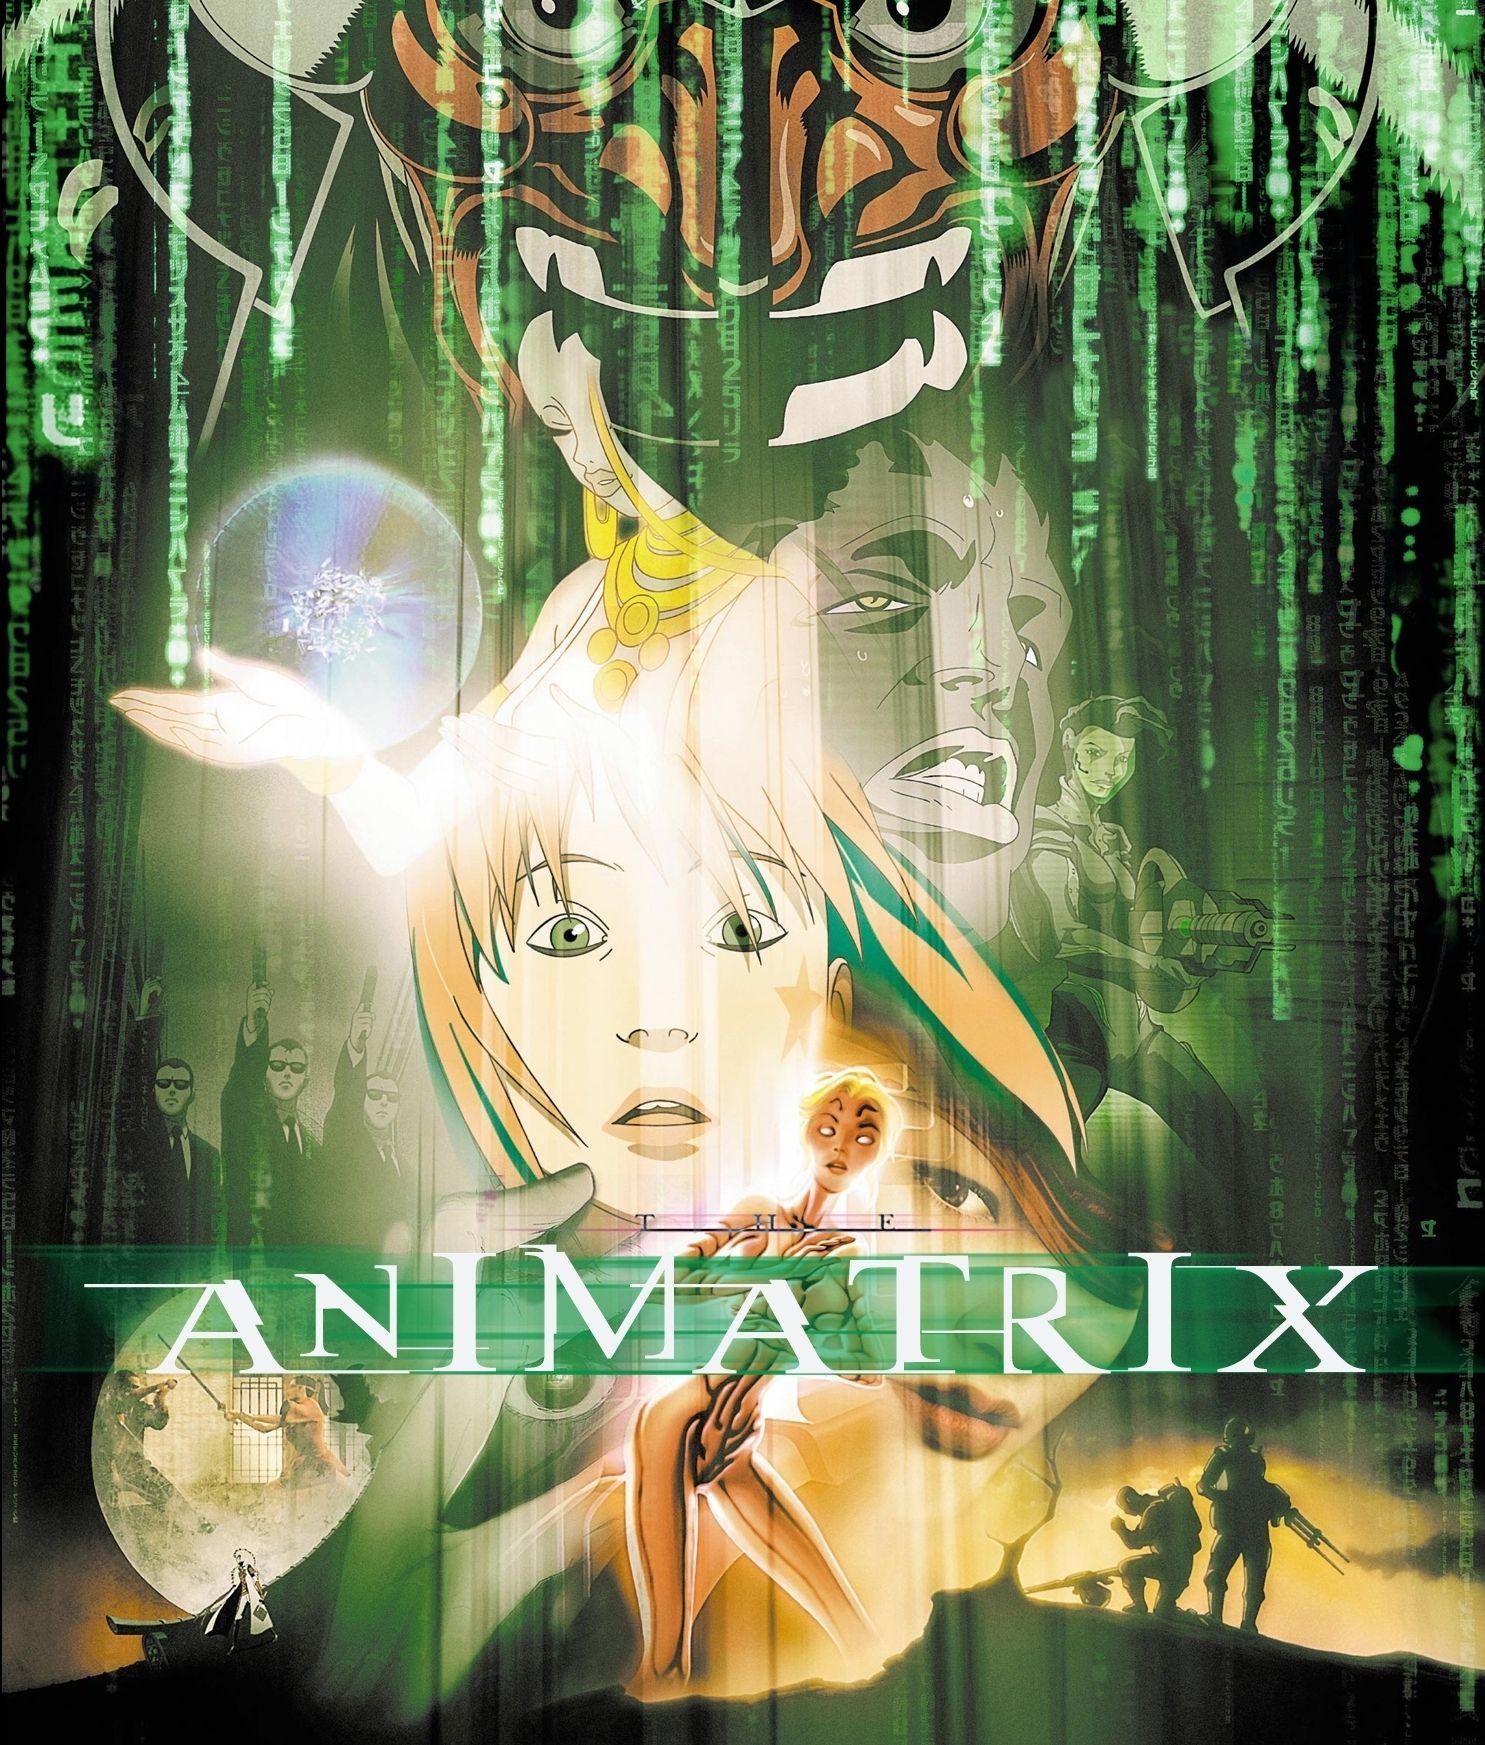 The Animatrix [2003] The animatrix, Anime, Animation